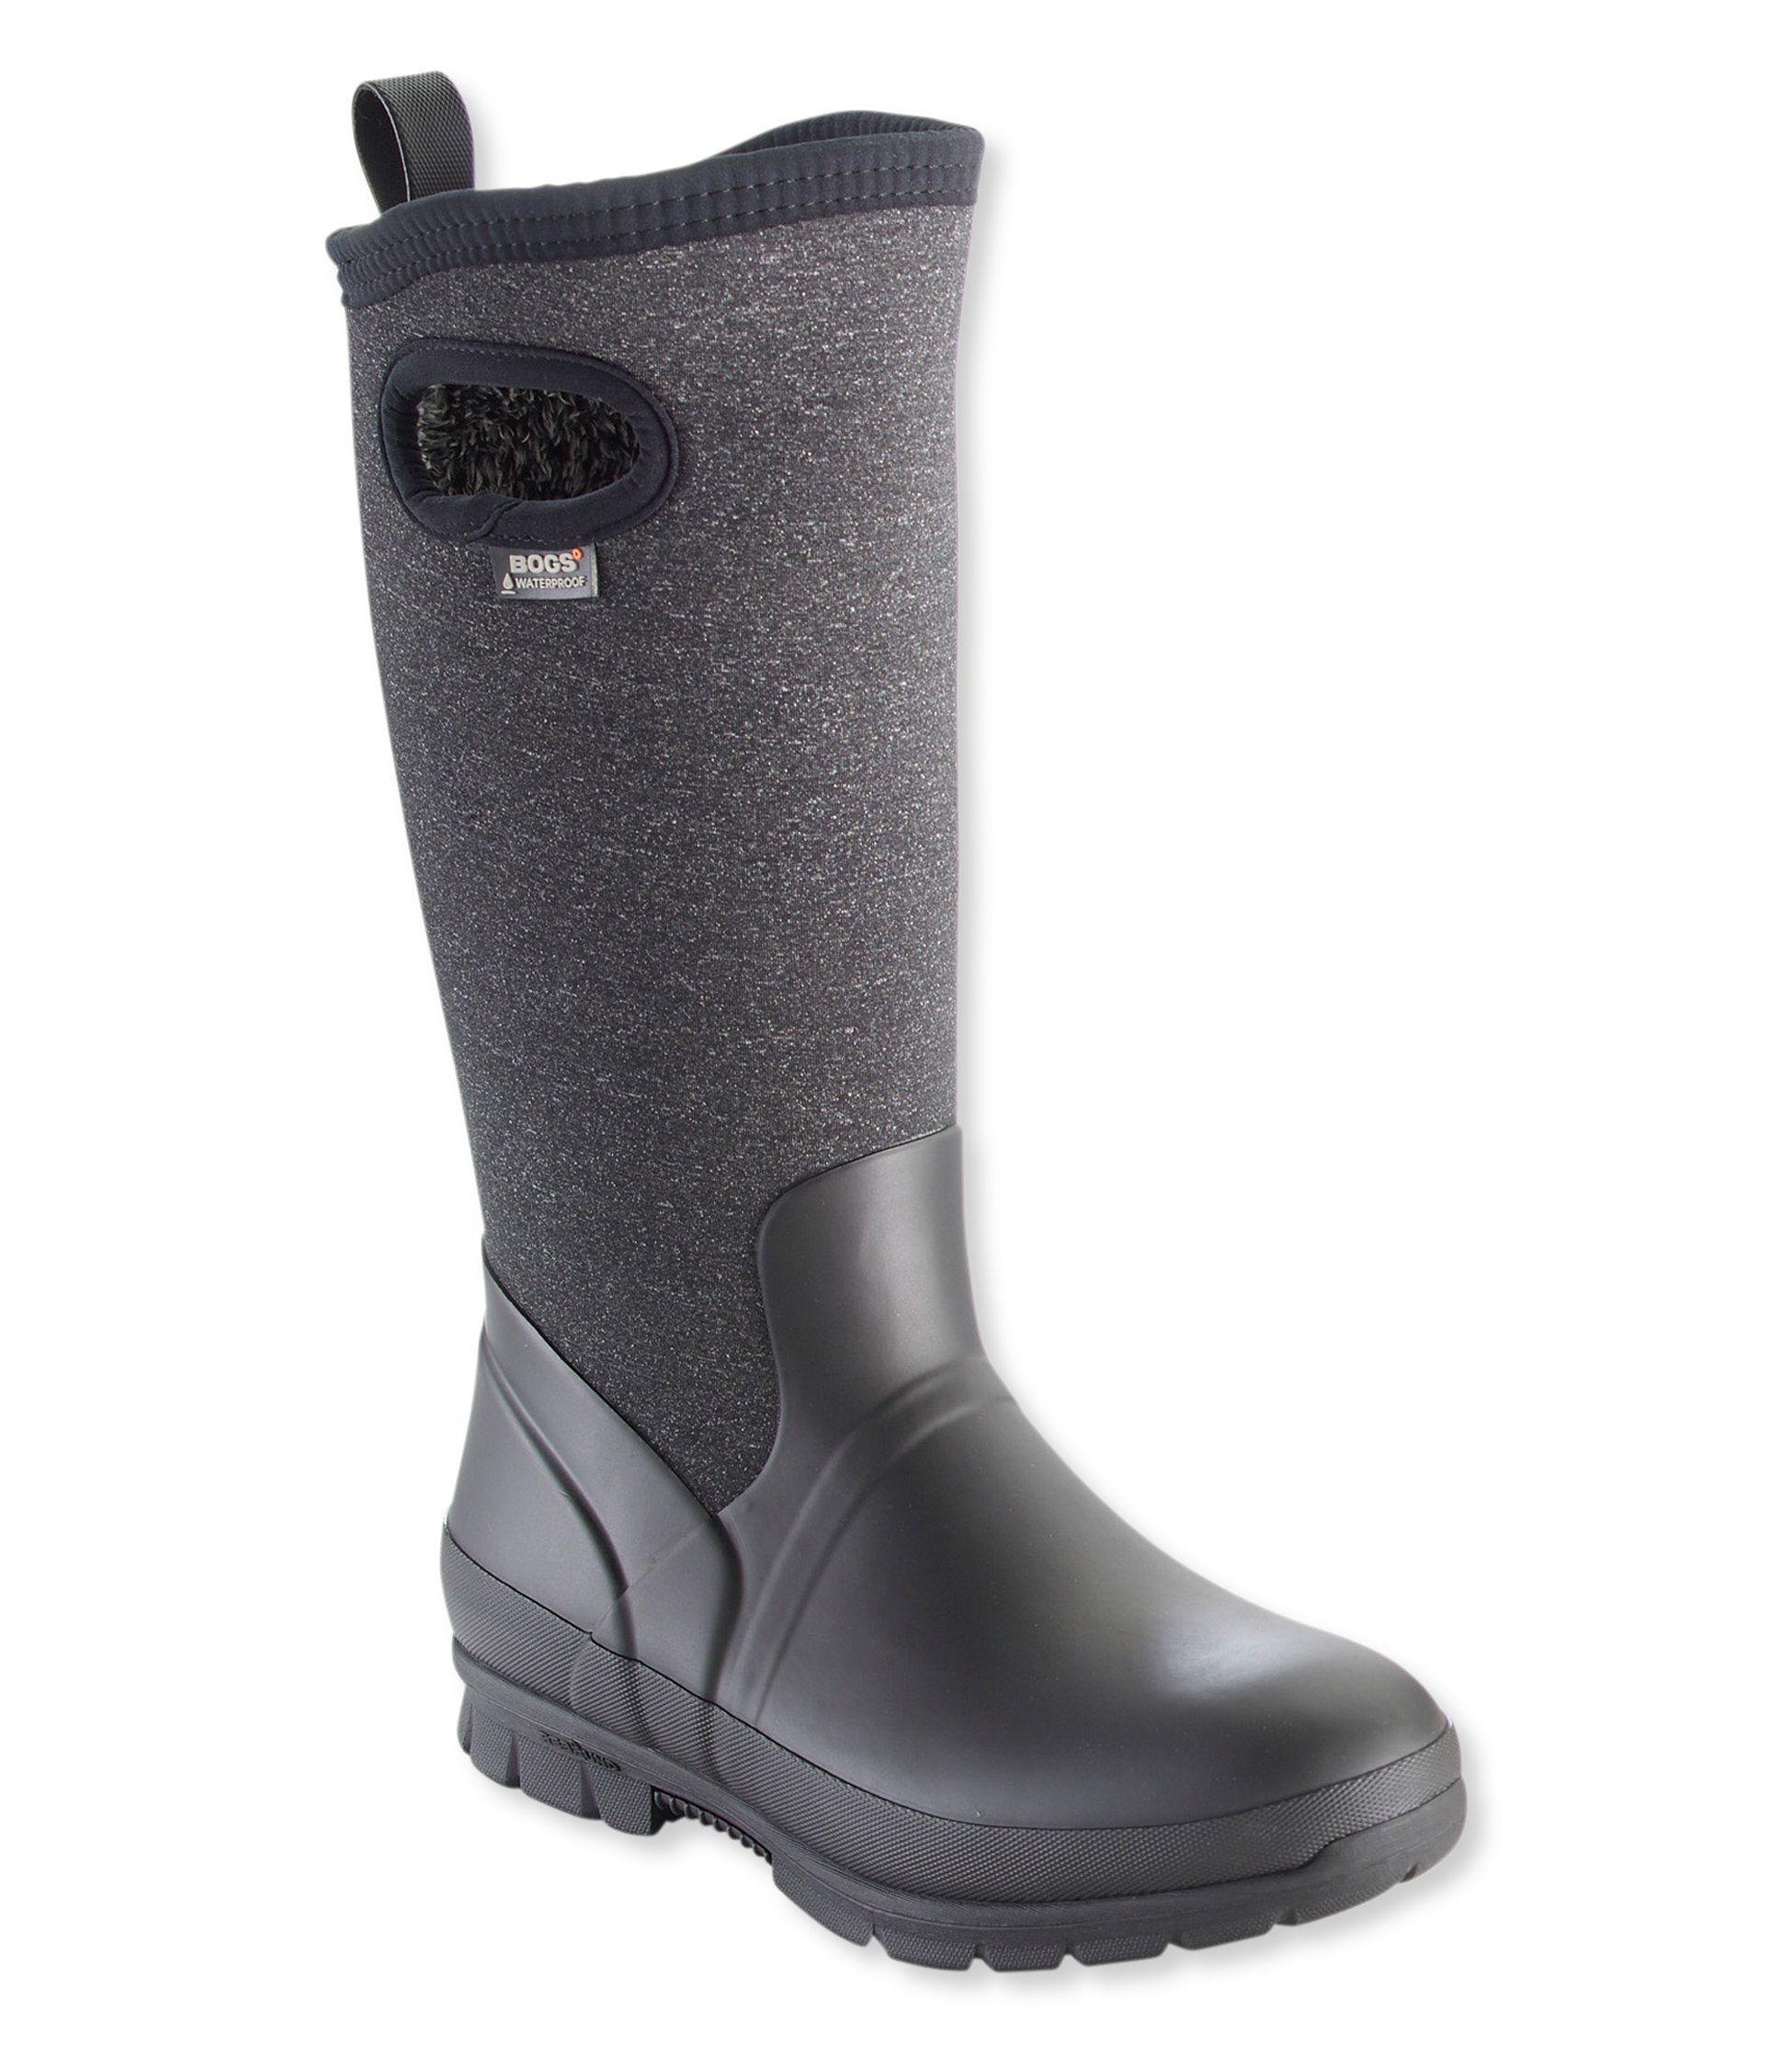 BOGS CRANDALL TALL Ladies Womens Waterproof Wellies Wellington Boots Dark Grey